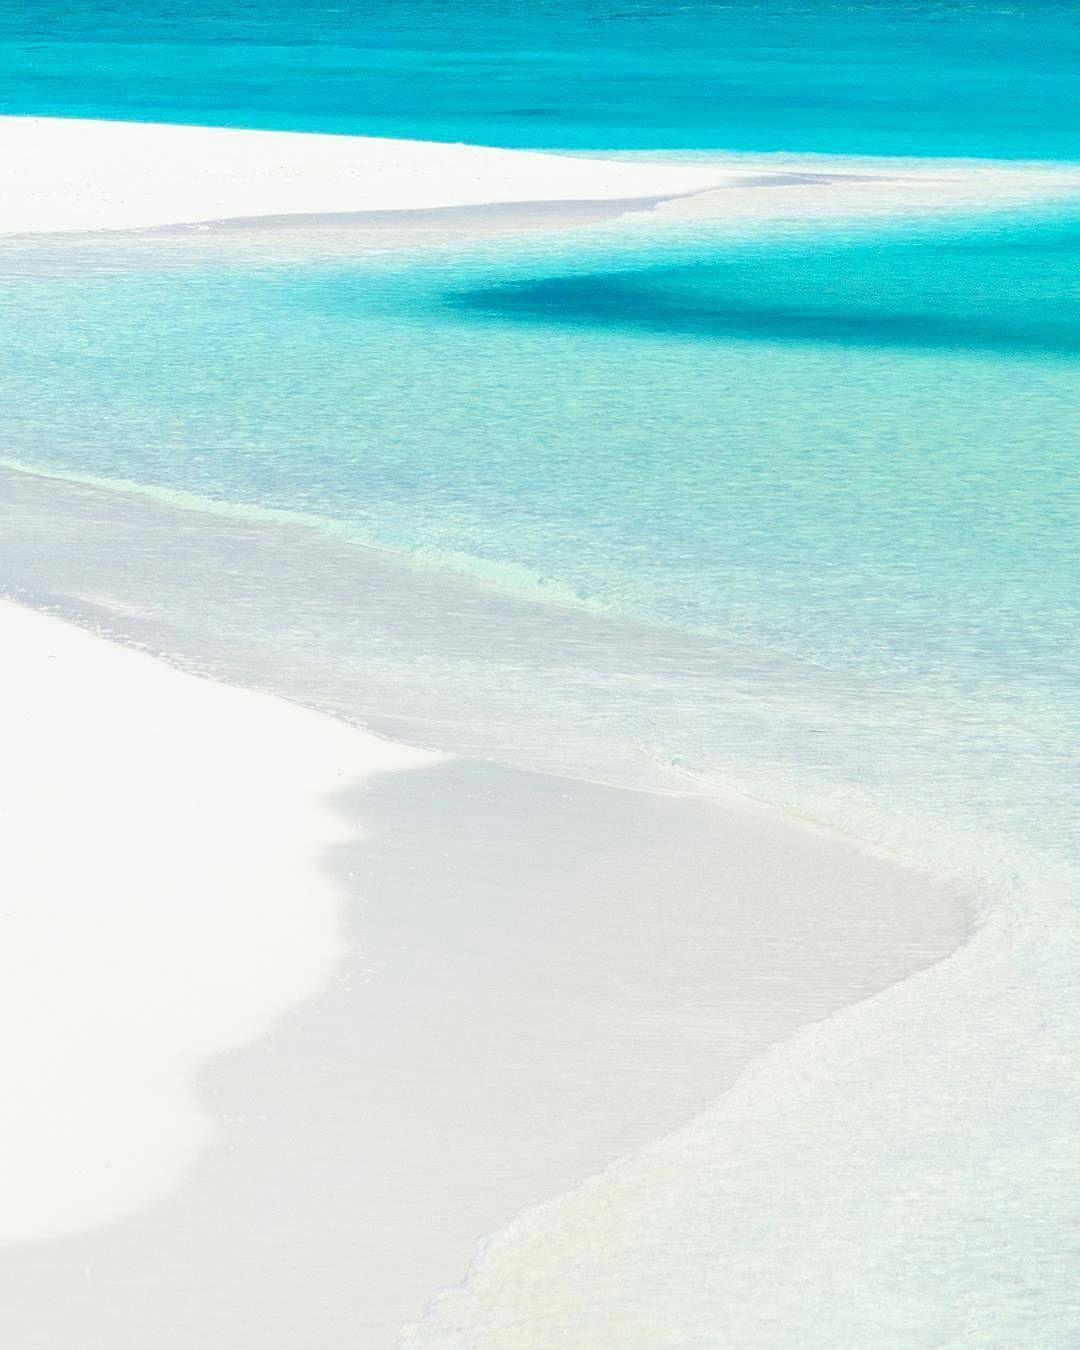 Amillafushi Maldives Malediven Reisen Malediven Inseln